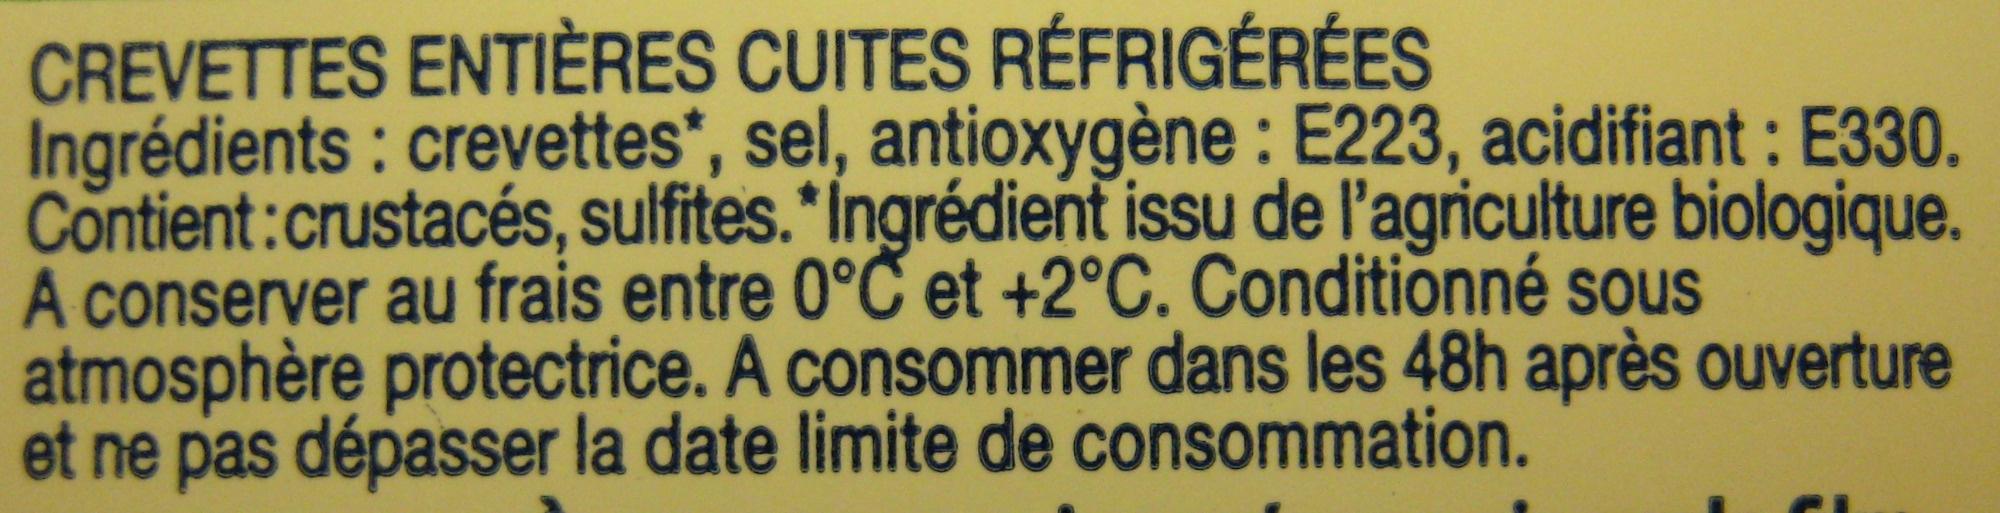 Crevettes Bio Delpierre - Ingrediënten - fr